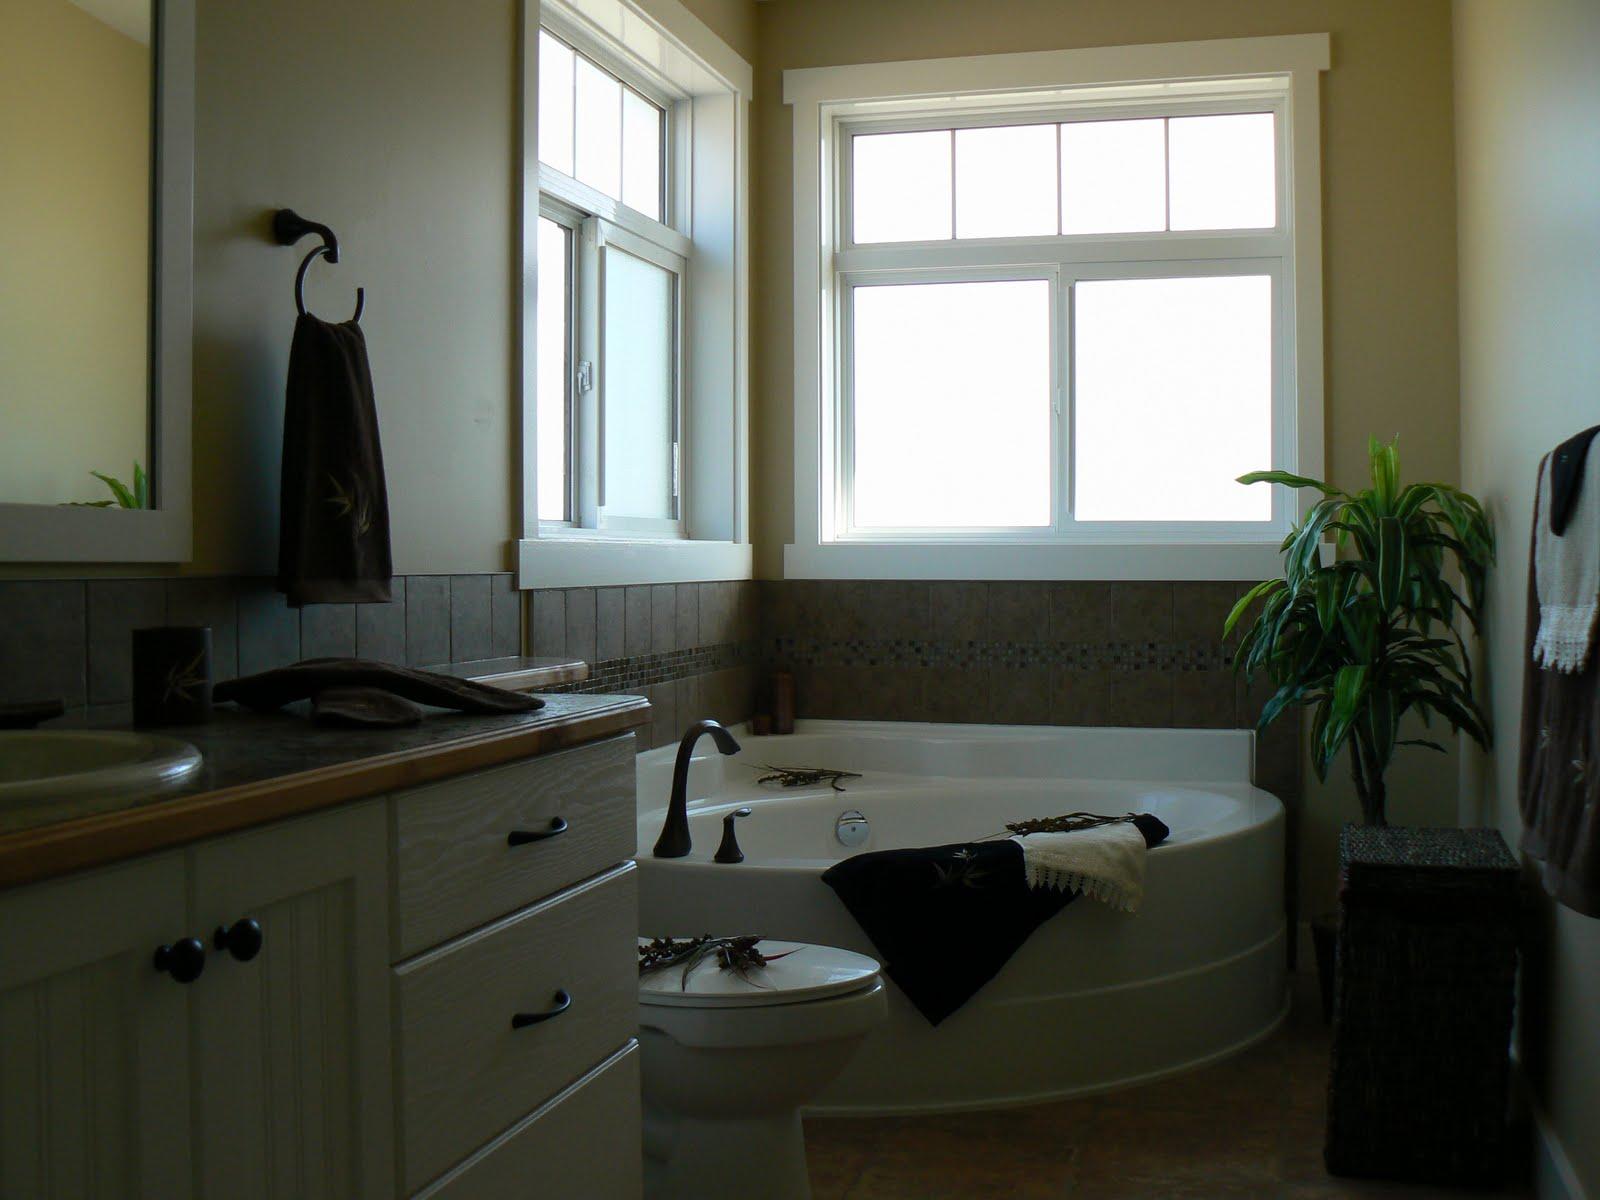 large opening windows above the corner tub